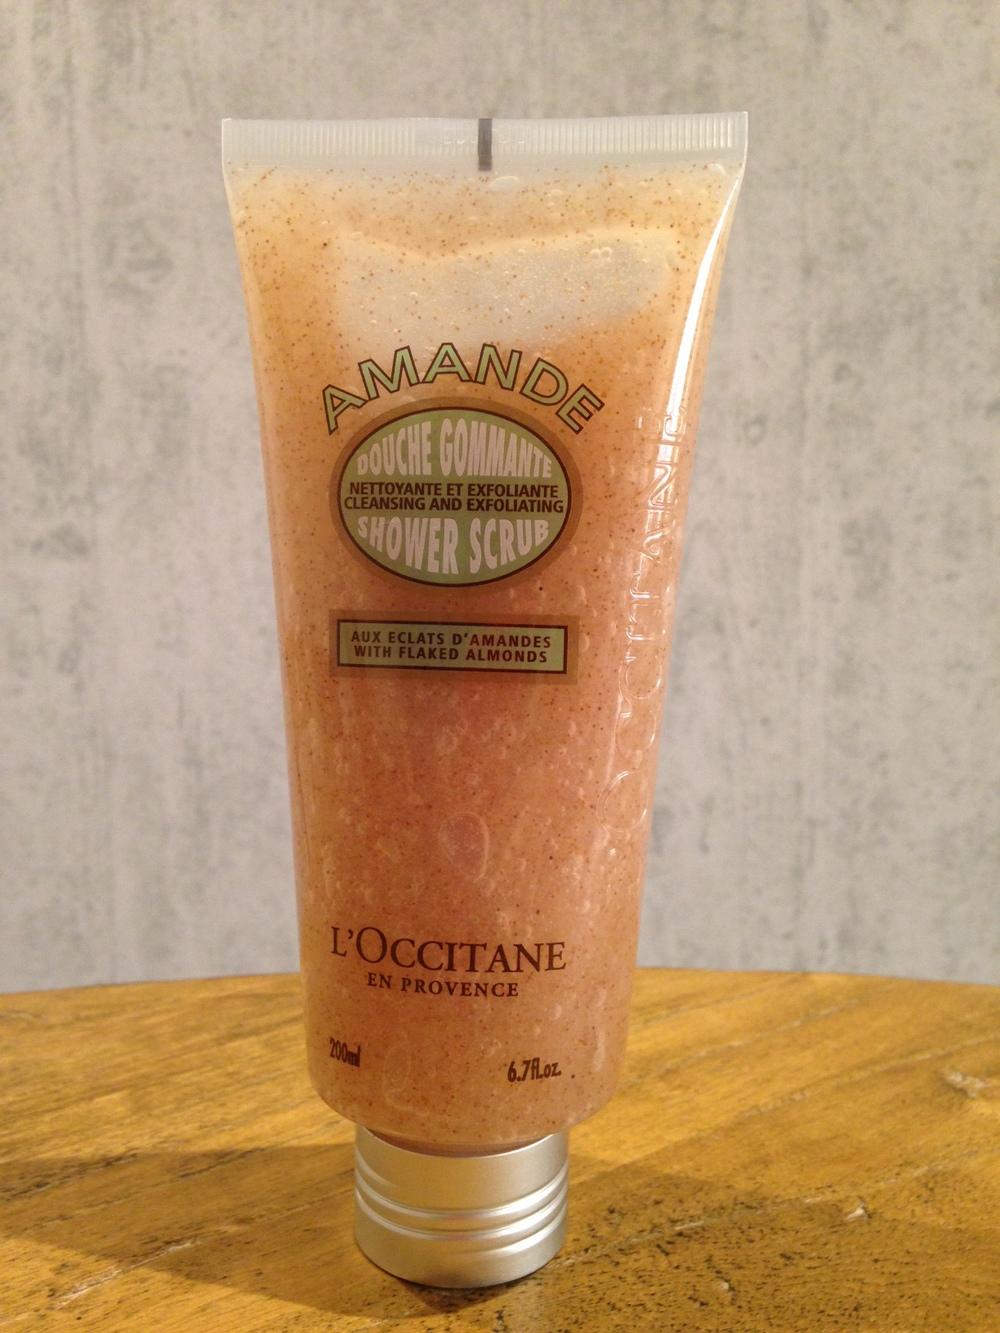 loccitane-gel-scrub-tpw-04.JPG